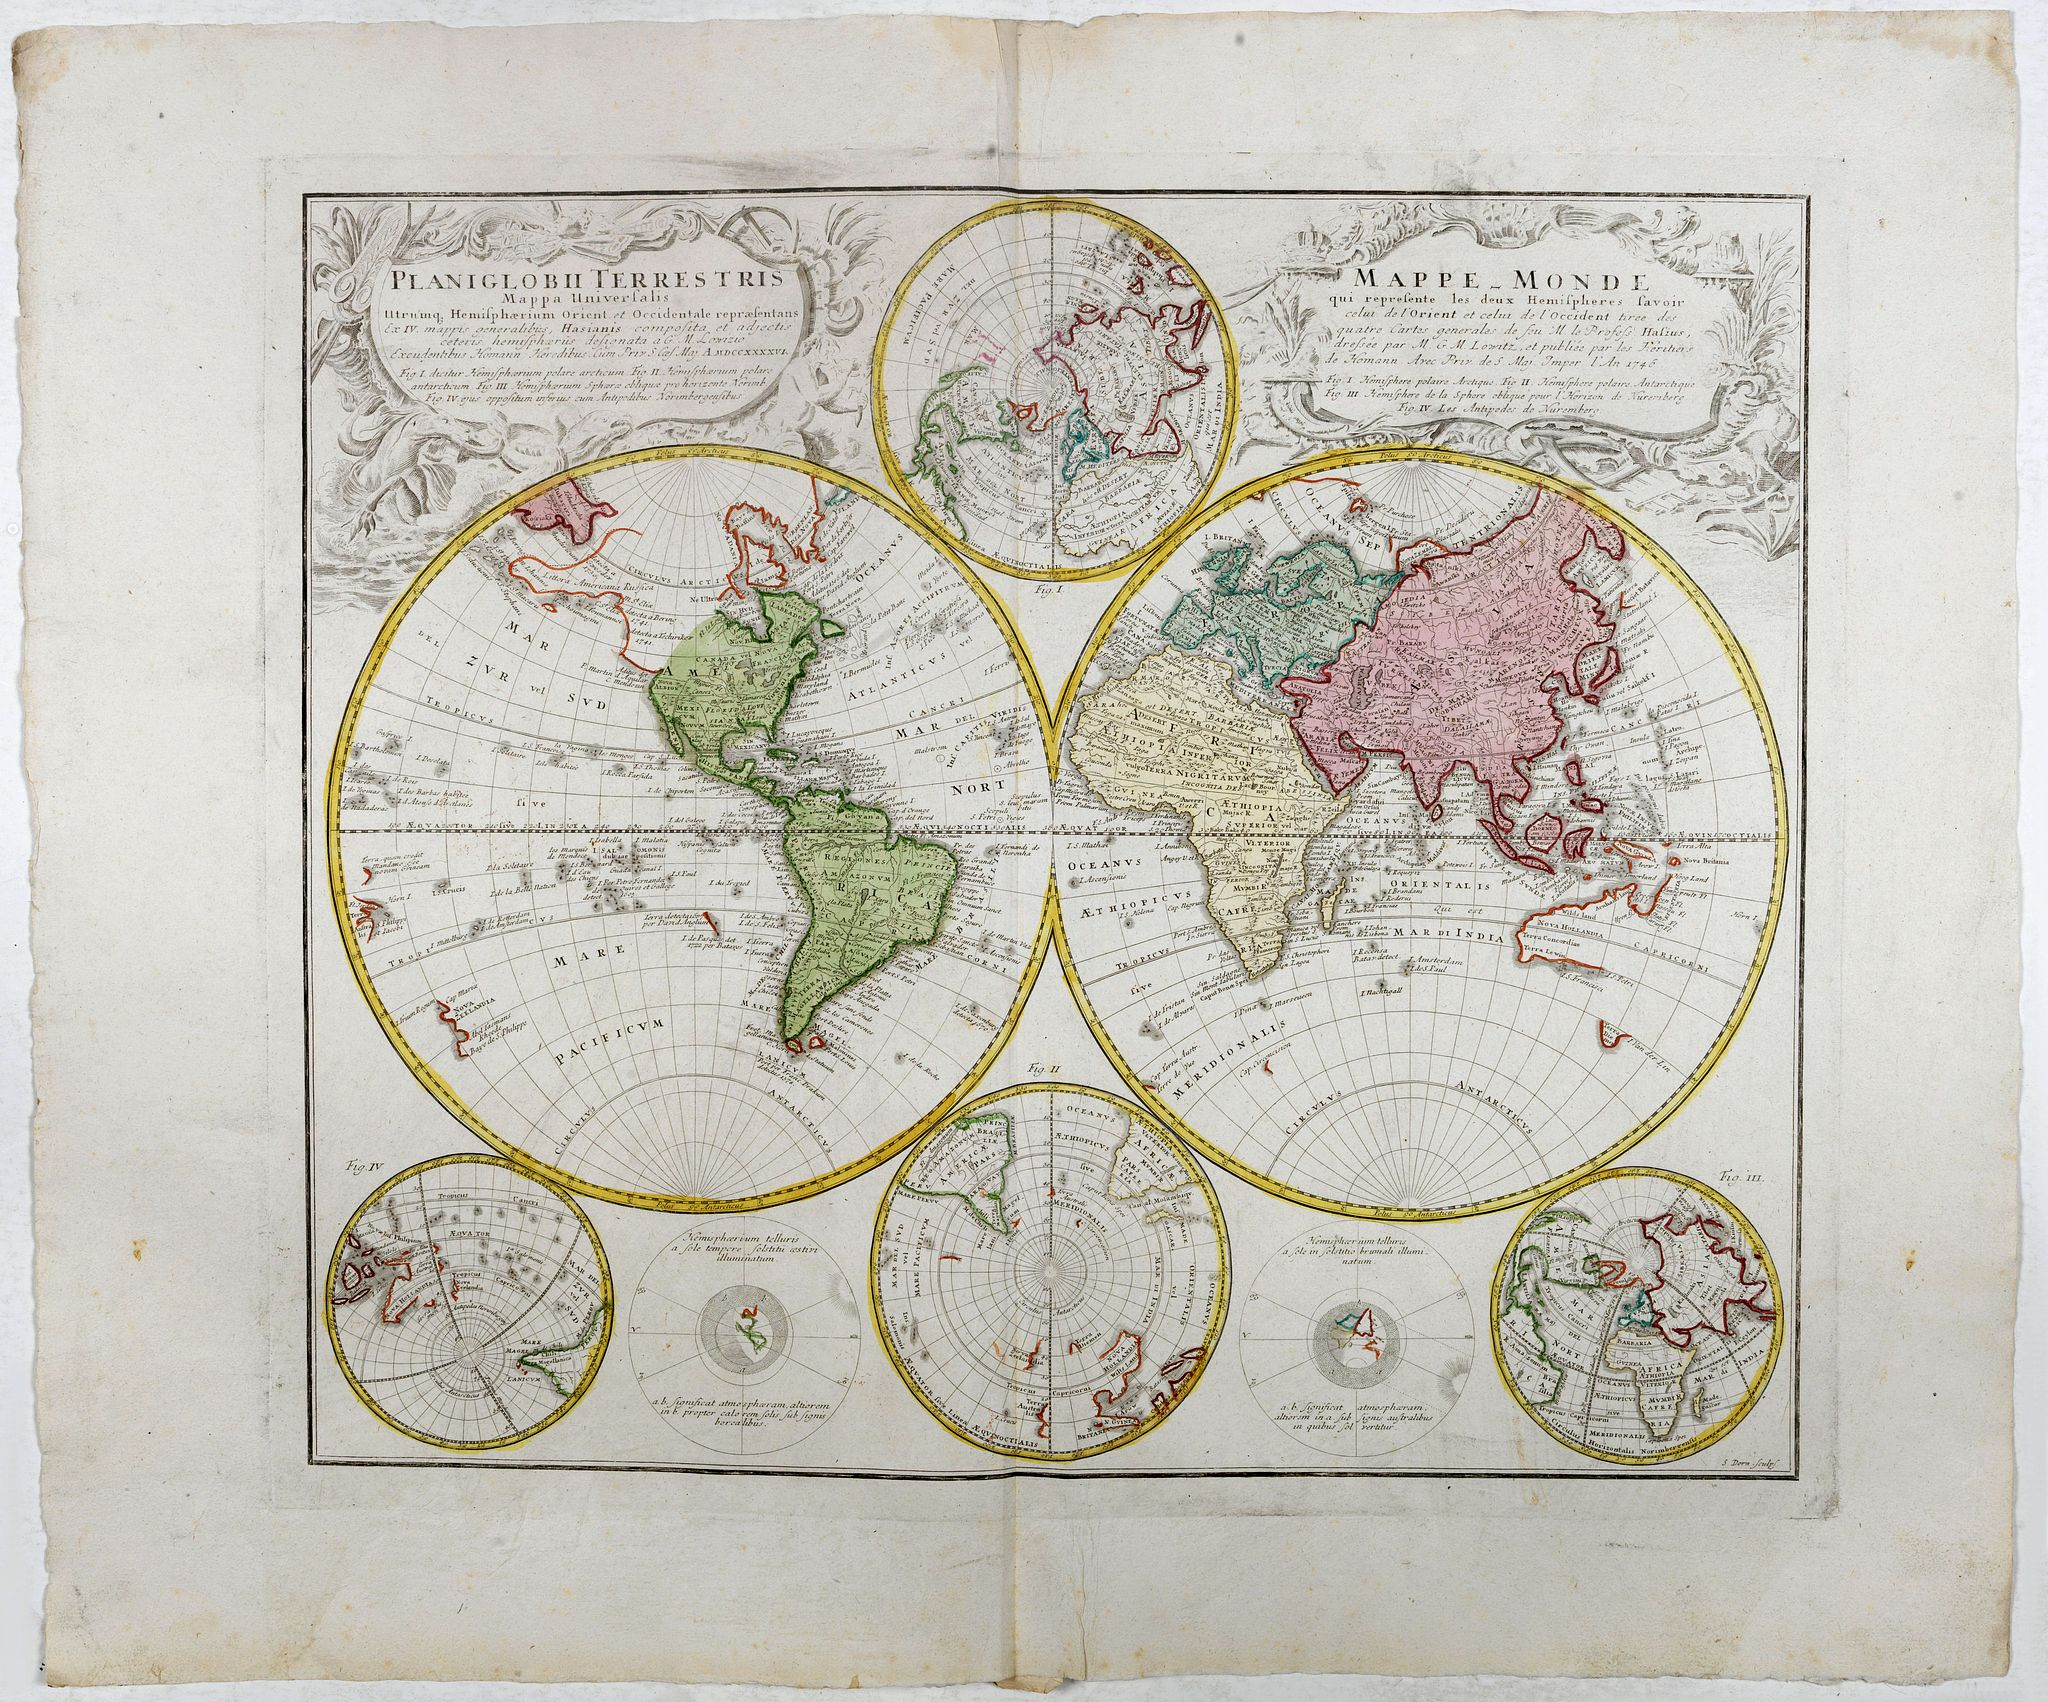 HOMANN HEIRS. -  Planiglobii Terrestris Mappa Universalis..  - Mappe-Monde qui represente les deux Hemispheres. . .